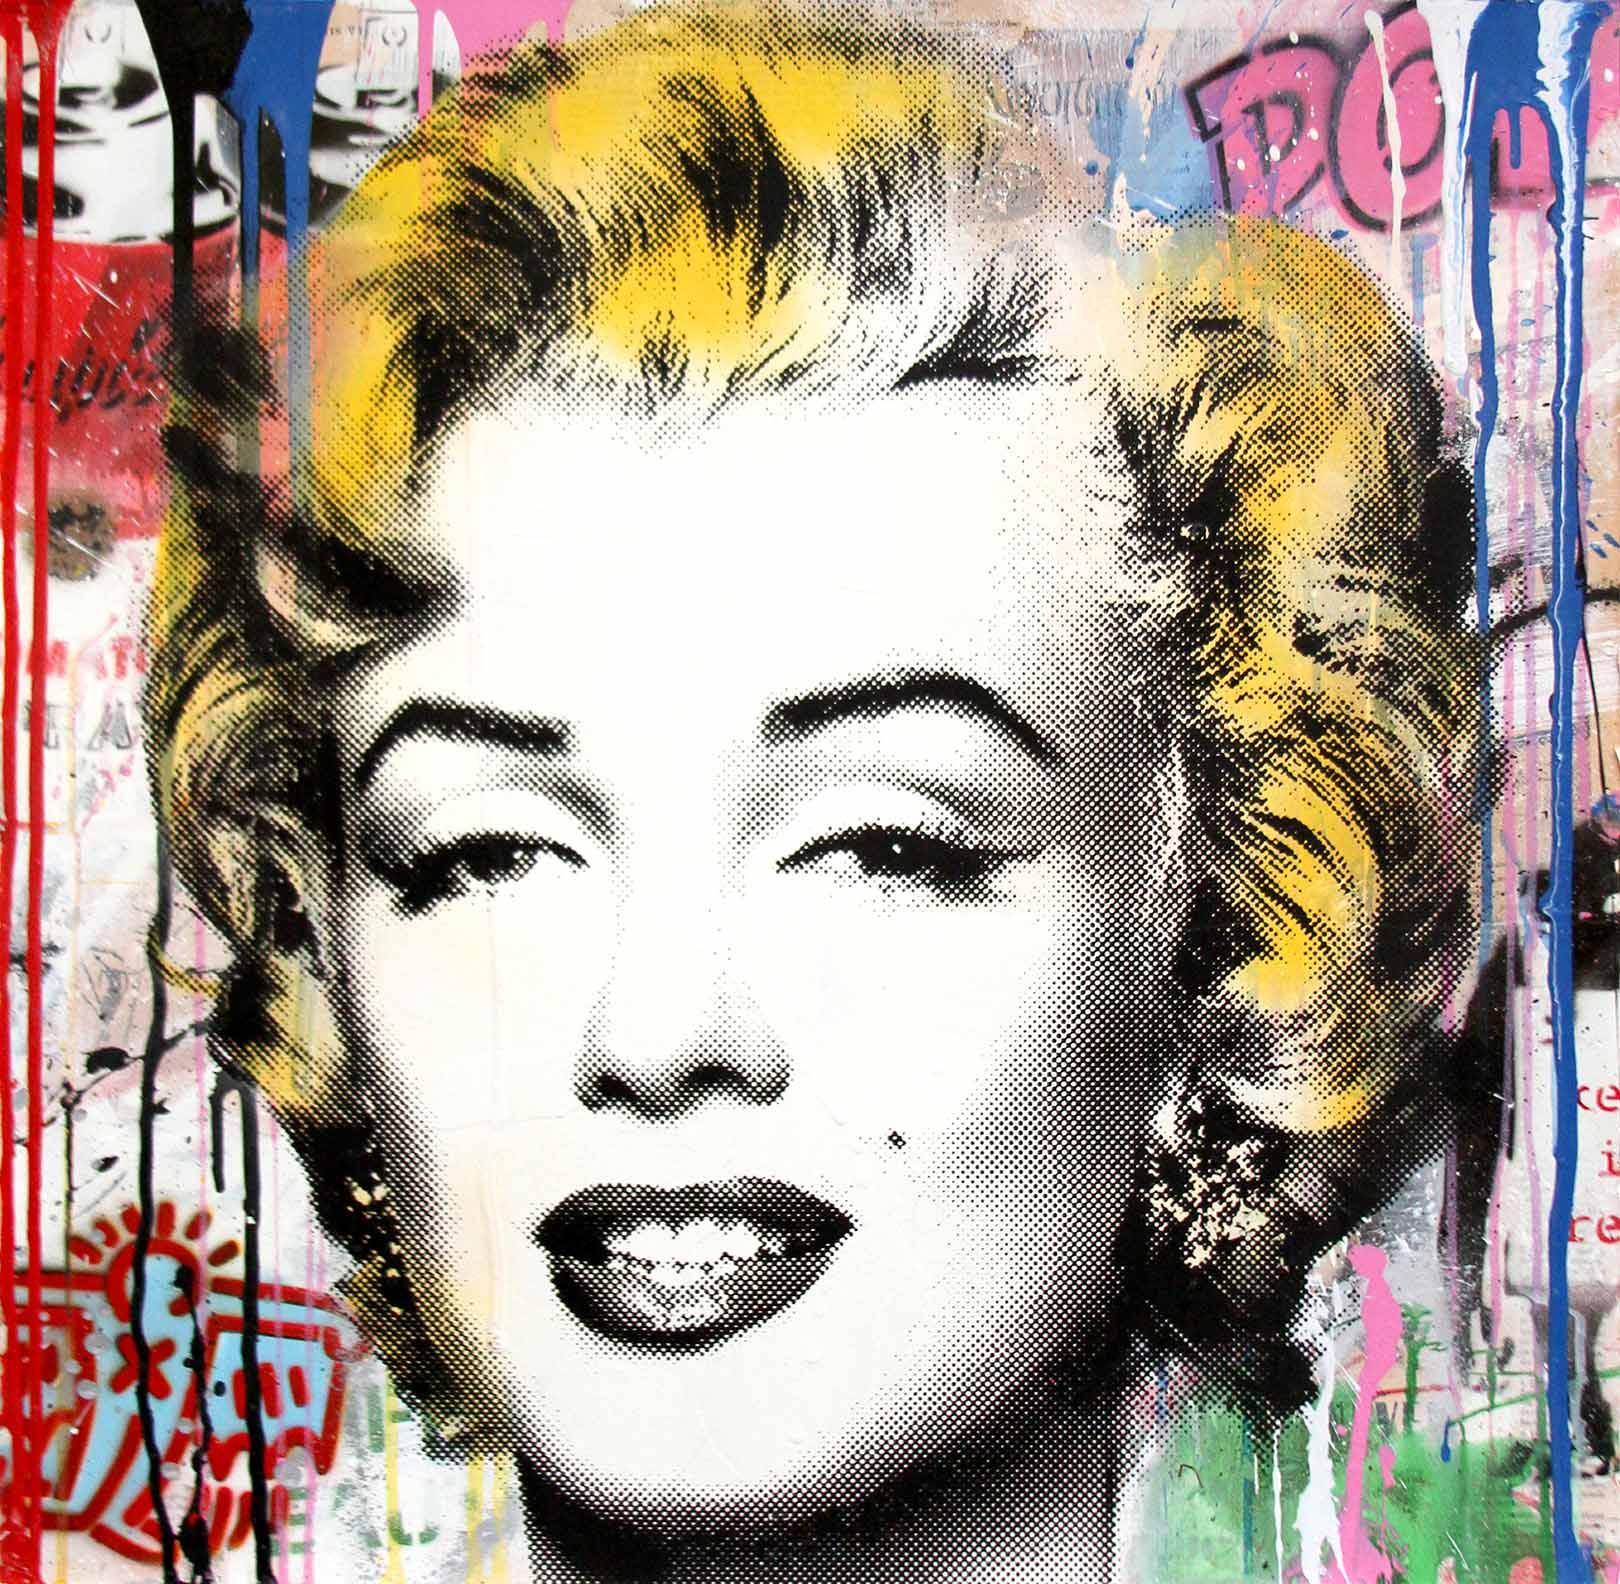 Mr. Brainwash - Marilyn (Mixed Media)